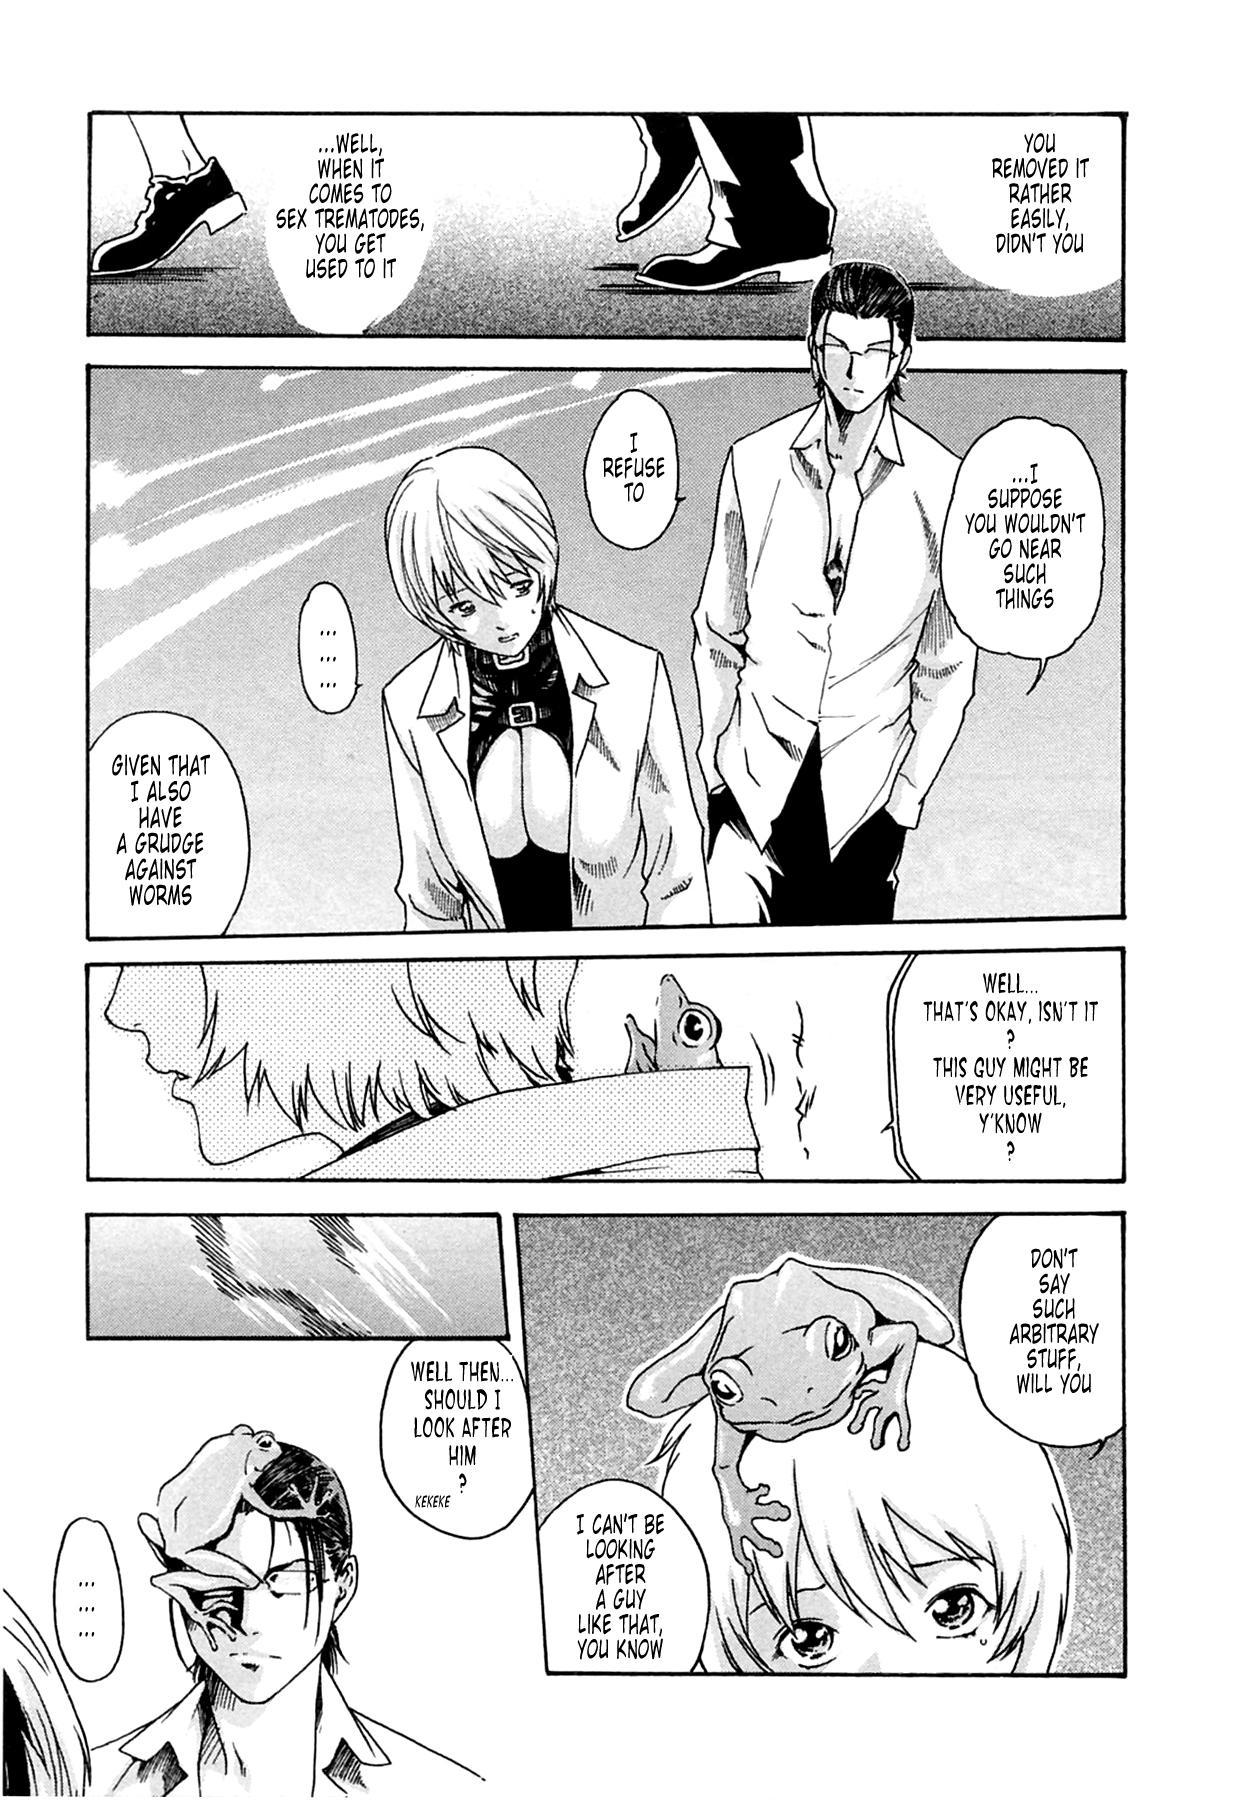 [Haruki] Kisei Juui Suzune (Parasite Doctor Suzune) Vol.02 - CH10-11 30